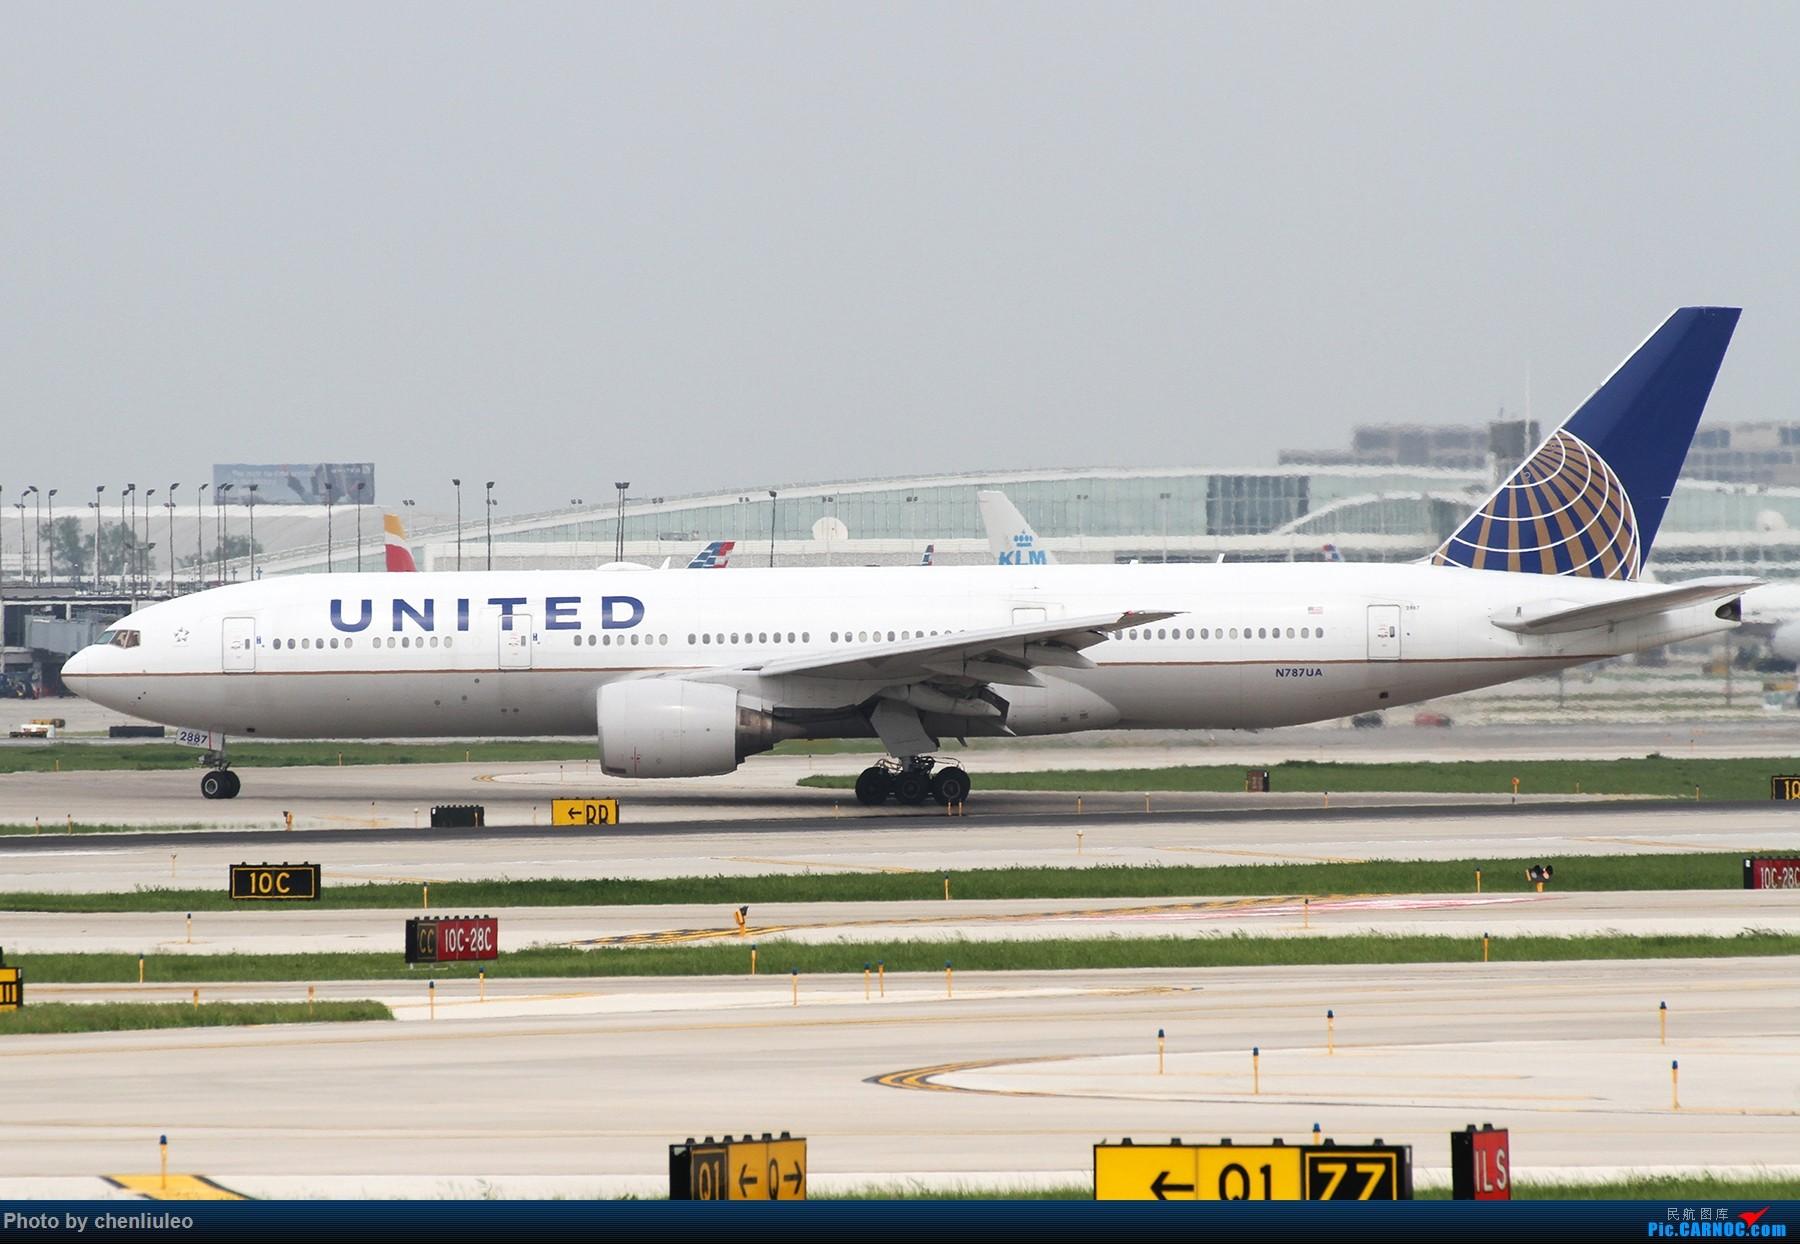 Re:[原创]【北美飞友会】芝加哥奥黑尔机场首拍 BOEING 777-200ER N787UA 美国芝加哥奥黑尔国际机场